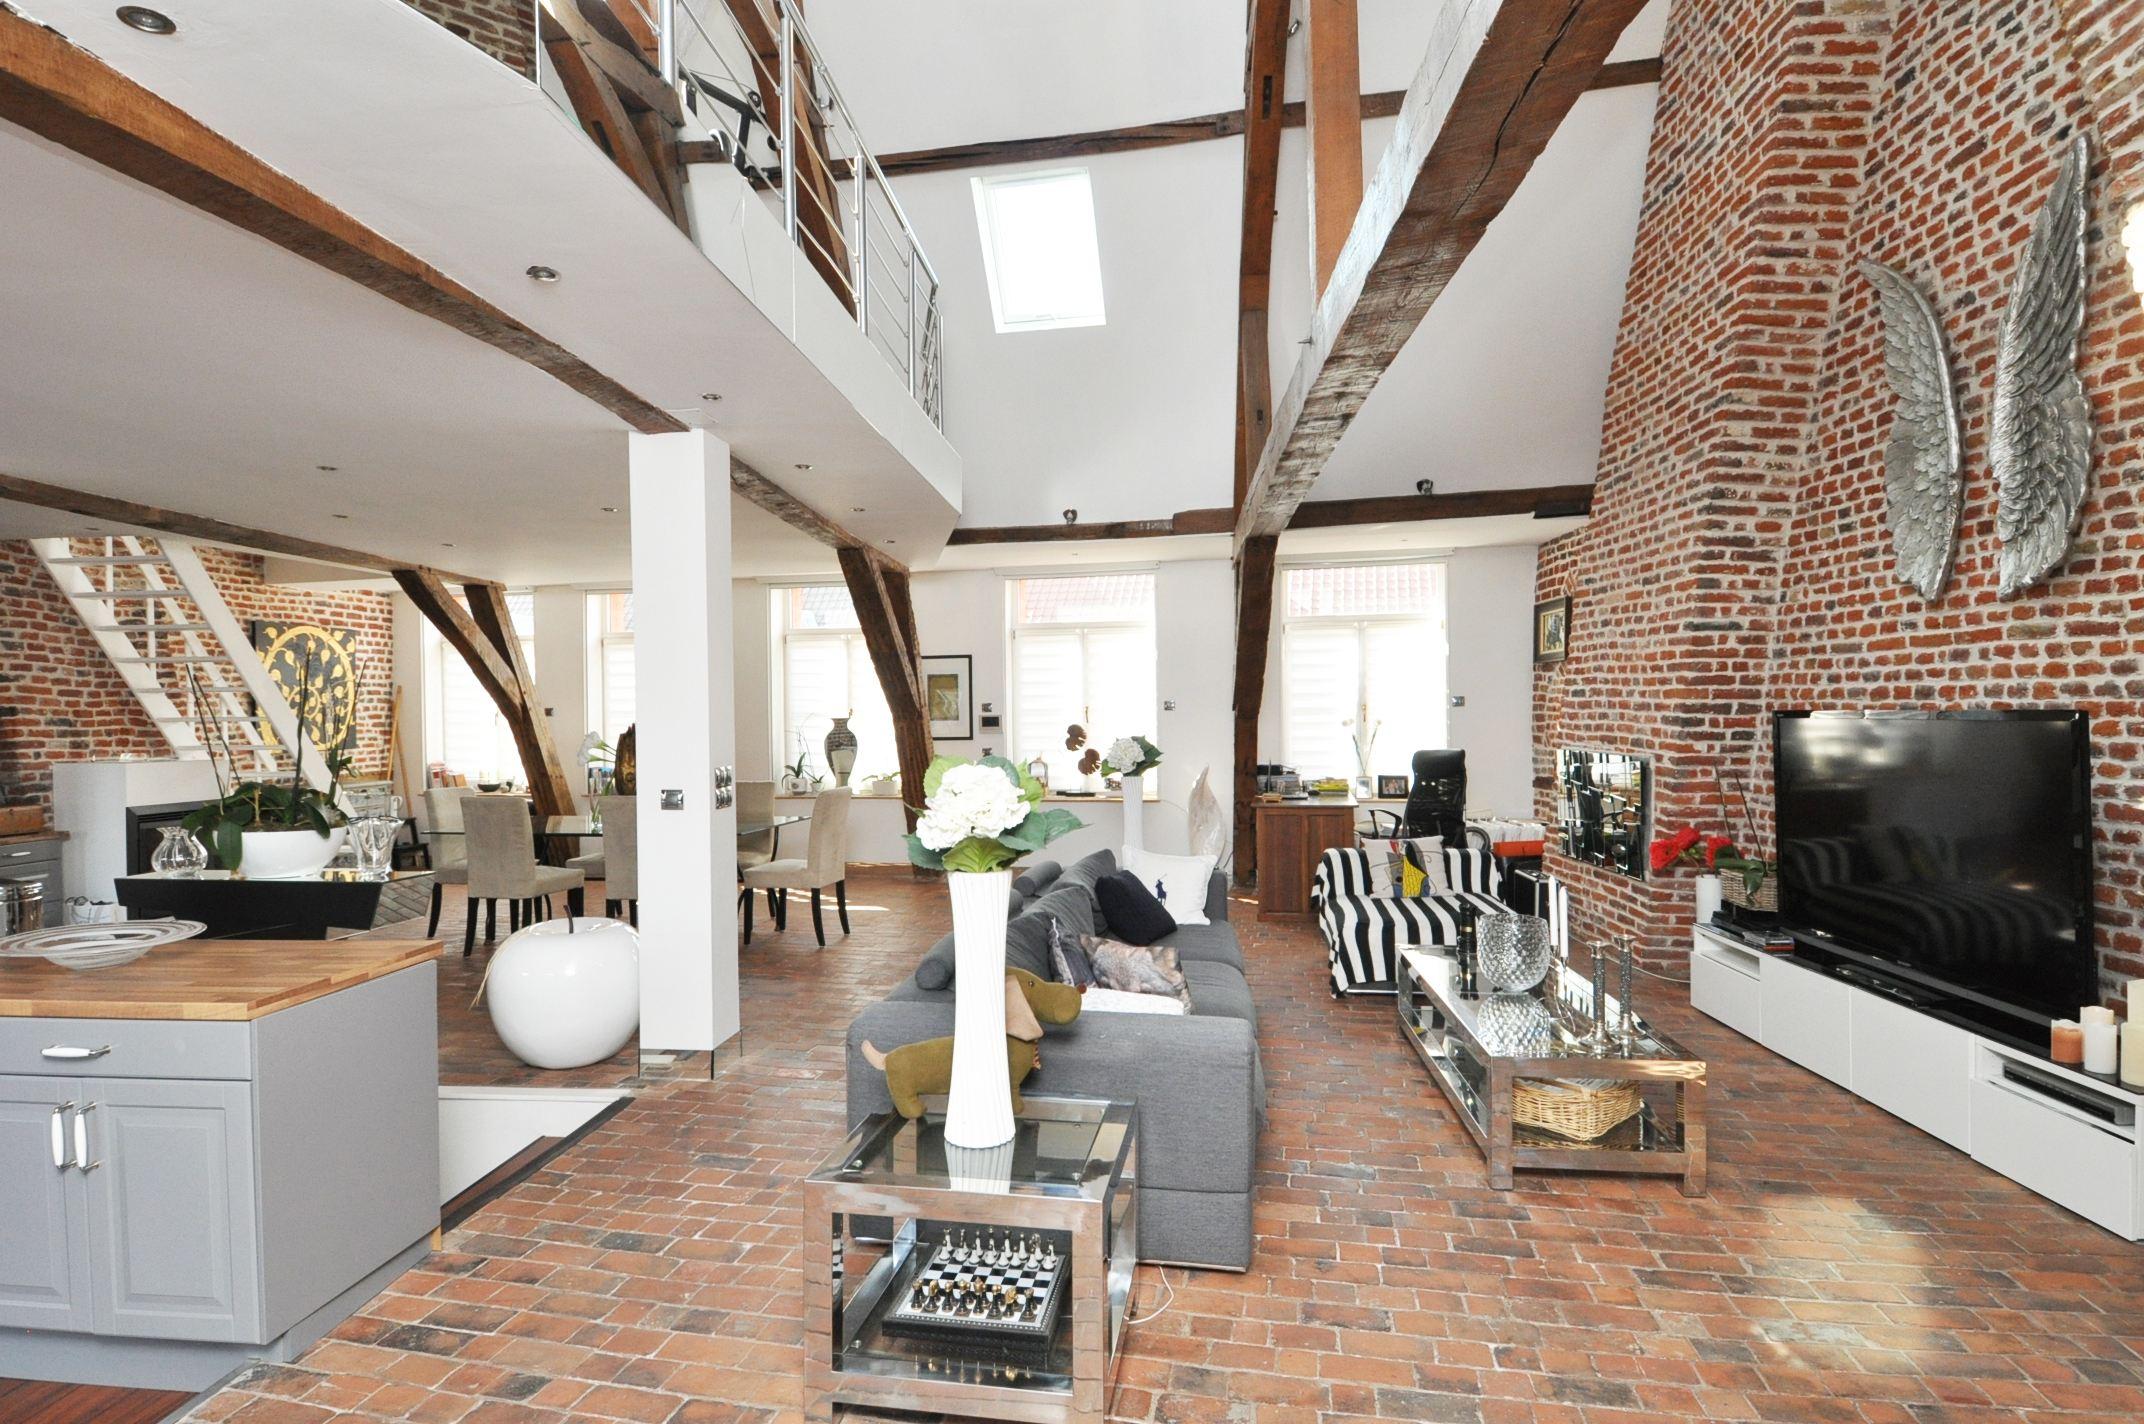 rentals property at DOUAI CITY CENTRE, 135sqm high-standard loft with 1 bedroom.